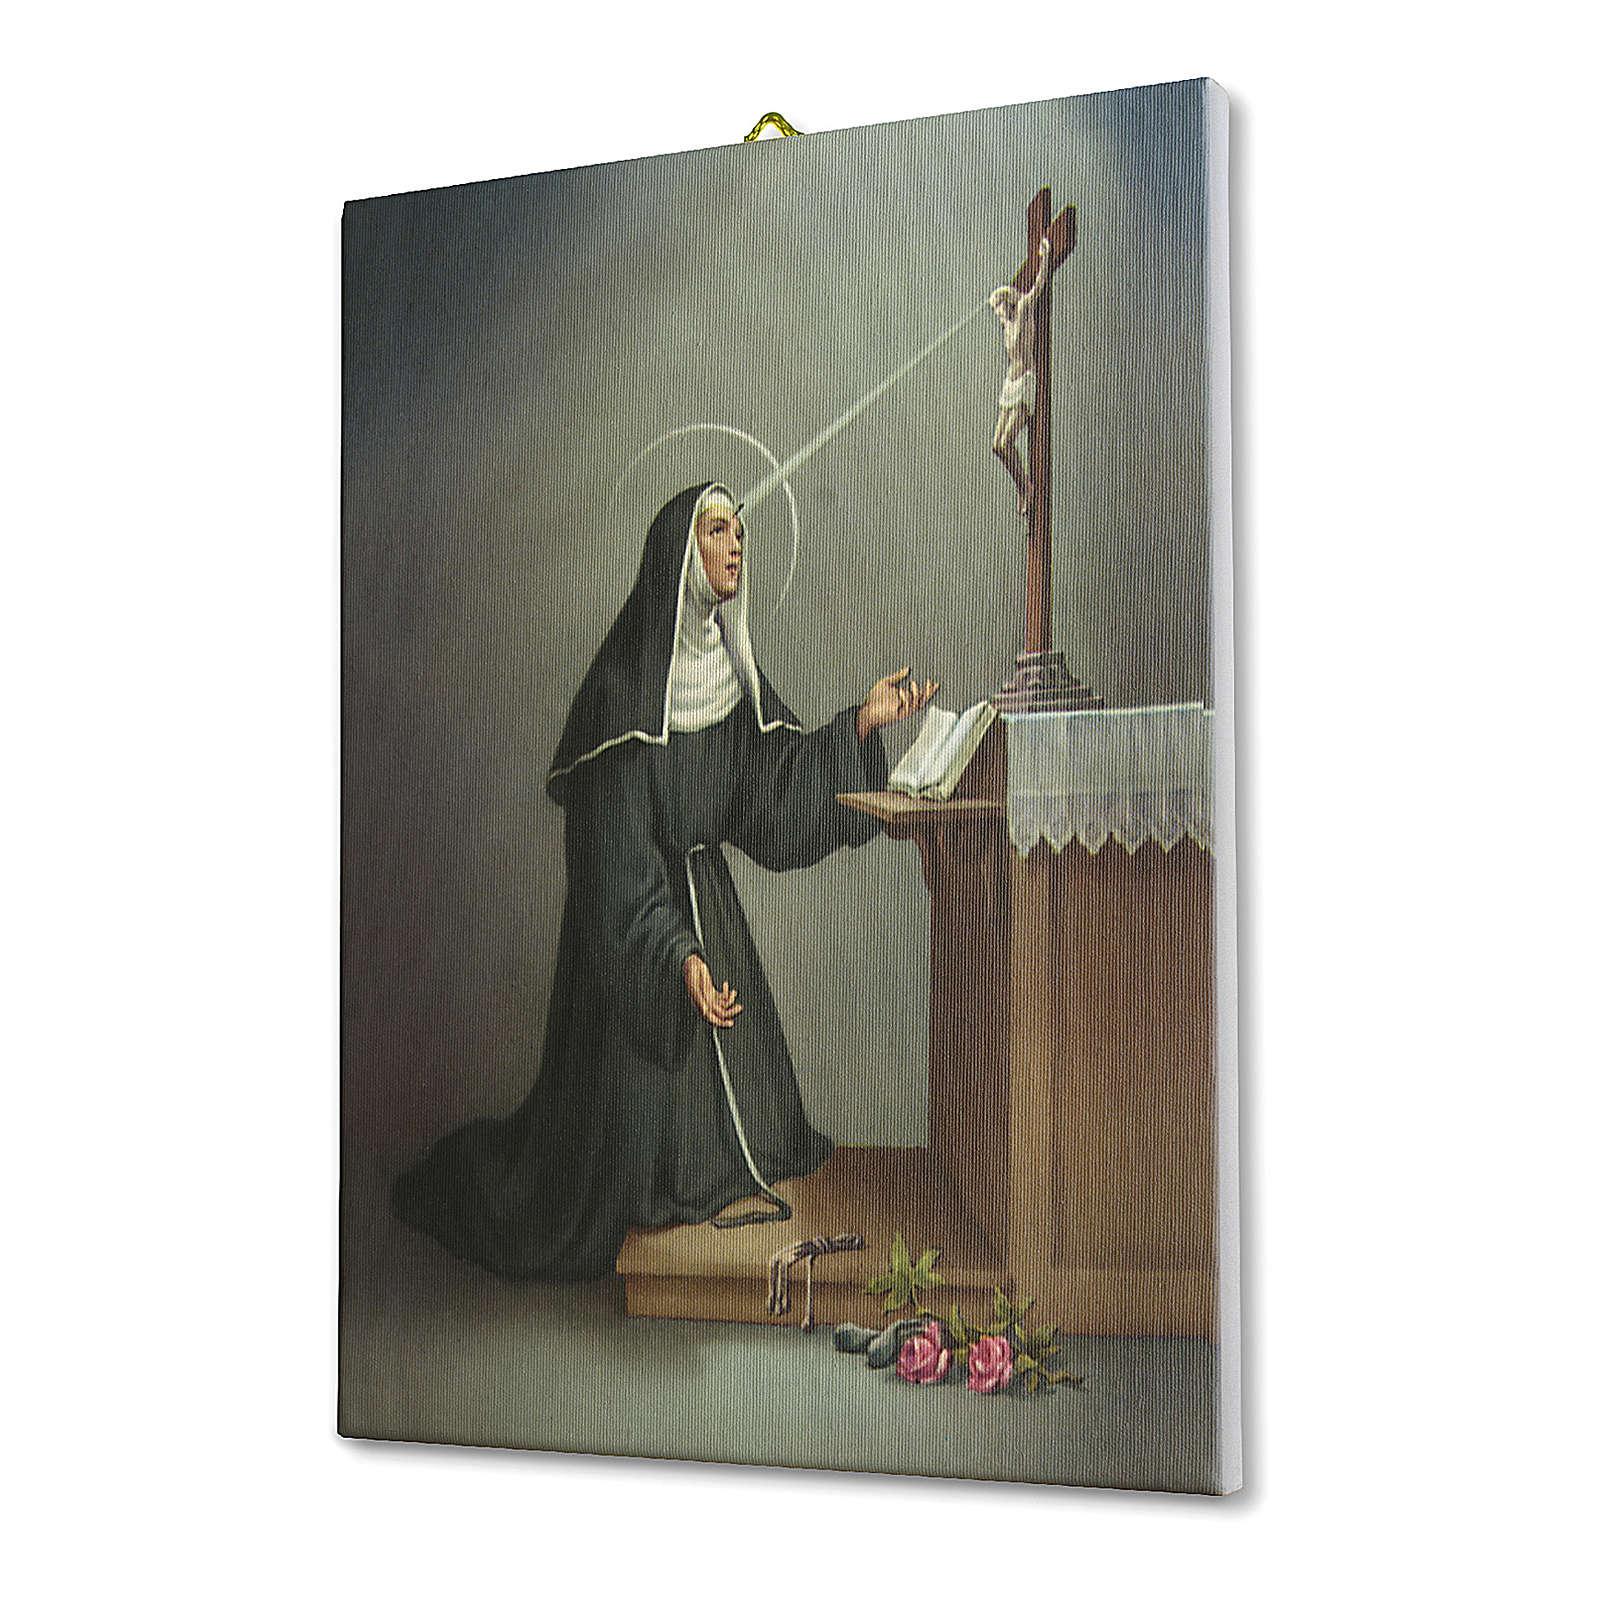 Tela pittorica quadro Santa Rita da Cascia 70x50 cm 3